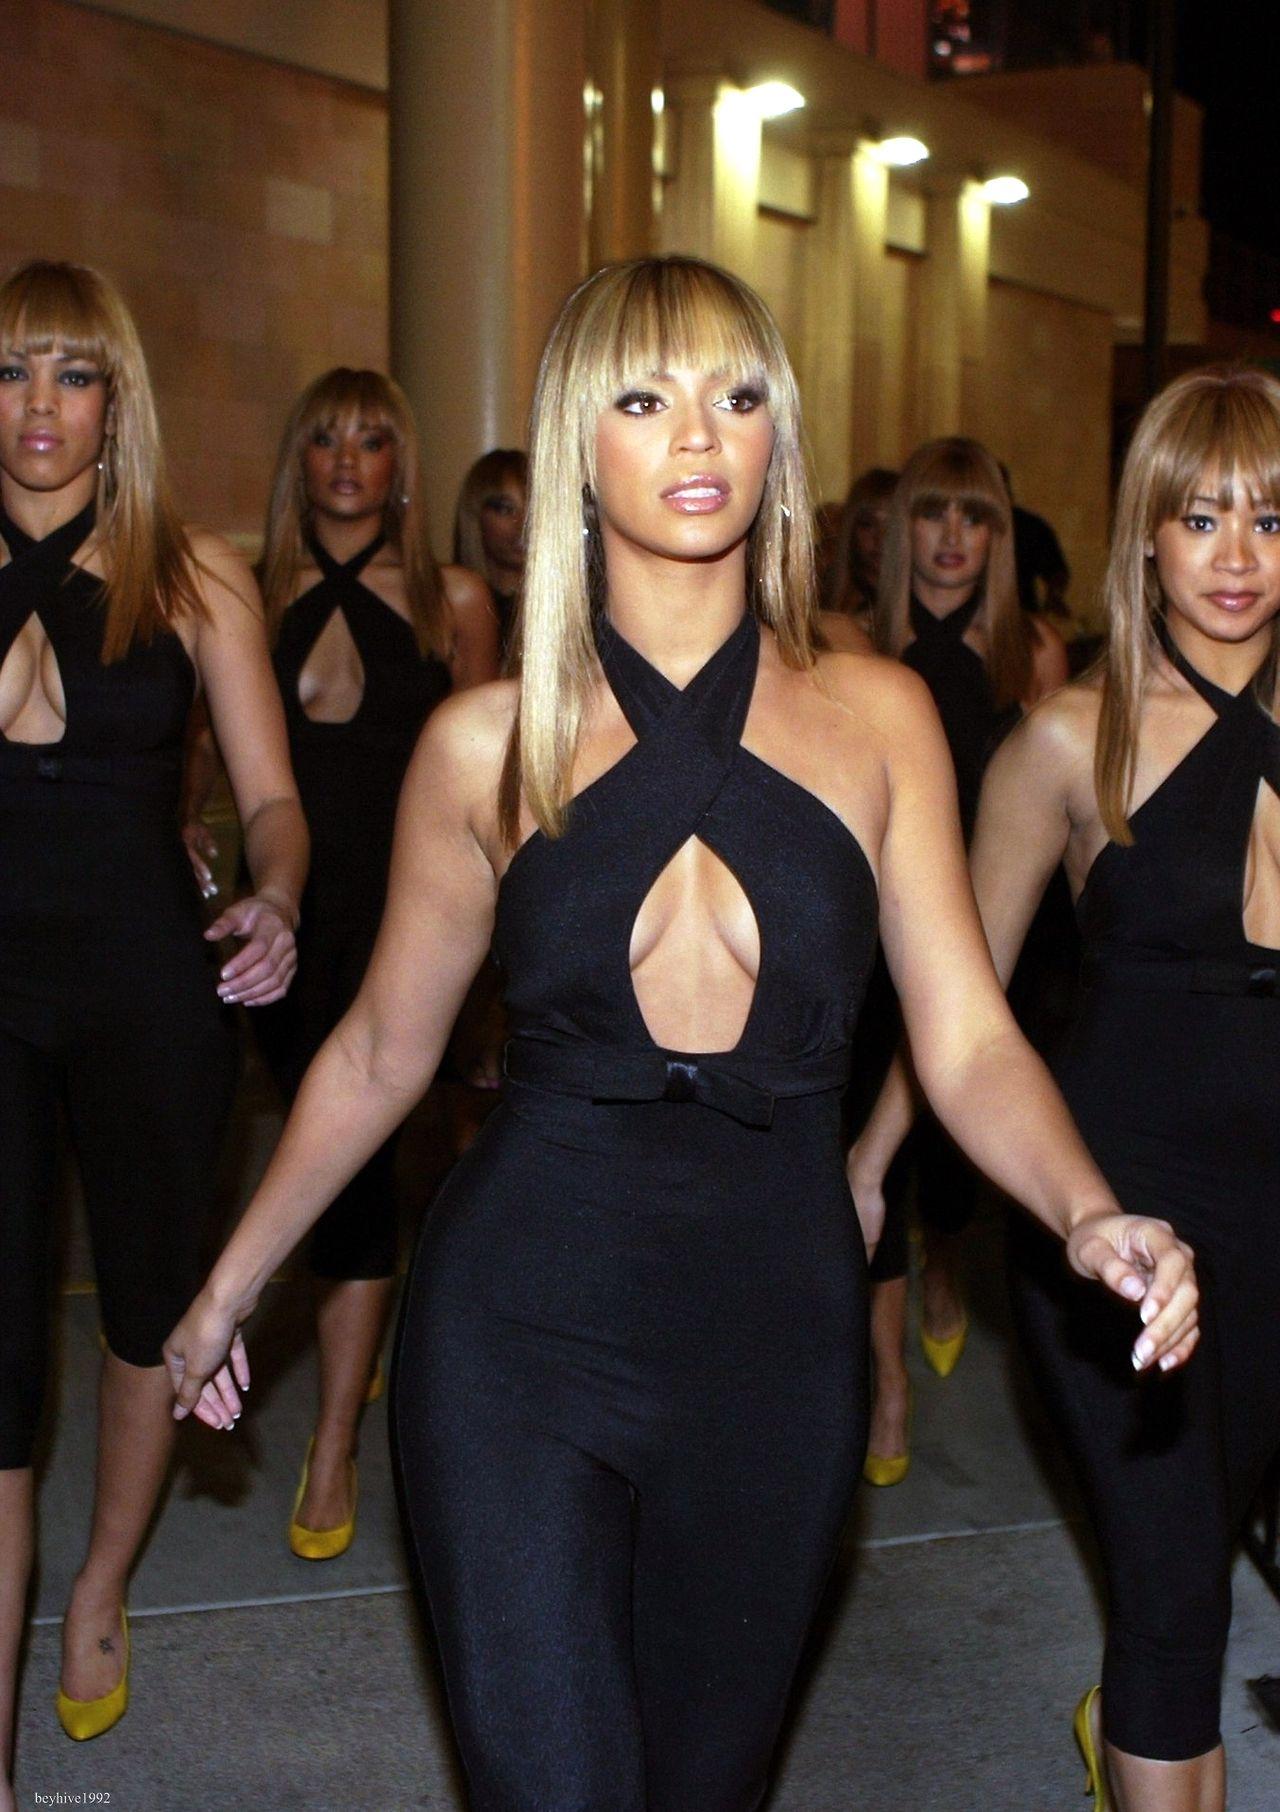 b58a894ecb2e Beyoncé 2003-04 billboard awards